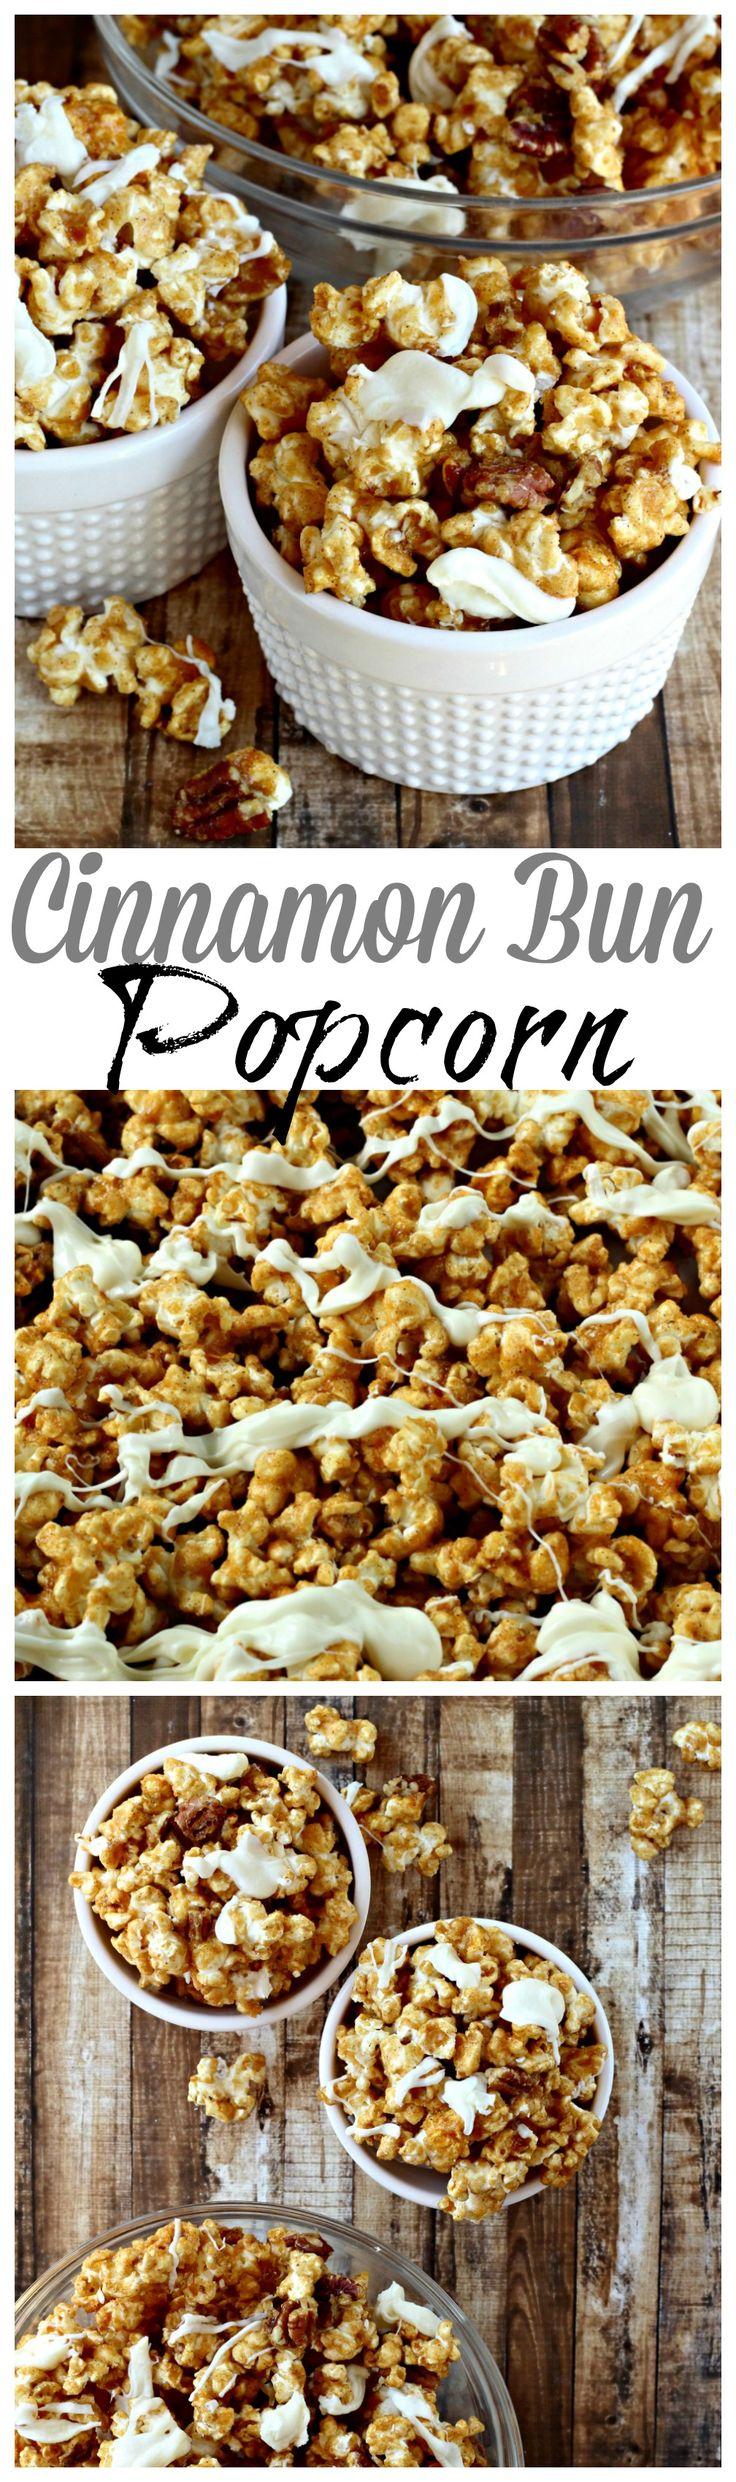 Pop Secret Popcorn topped with cinnamon-sugar and white chocolate, tastes just like a cinnamon bun!